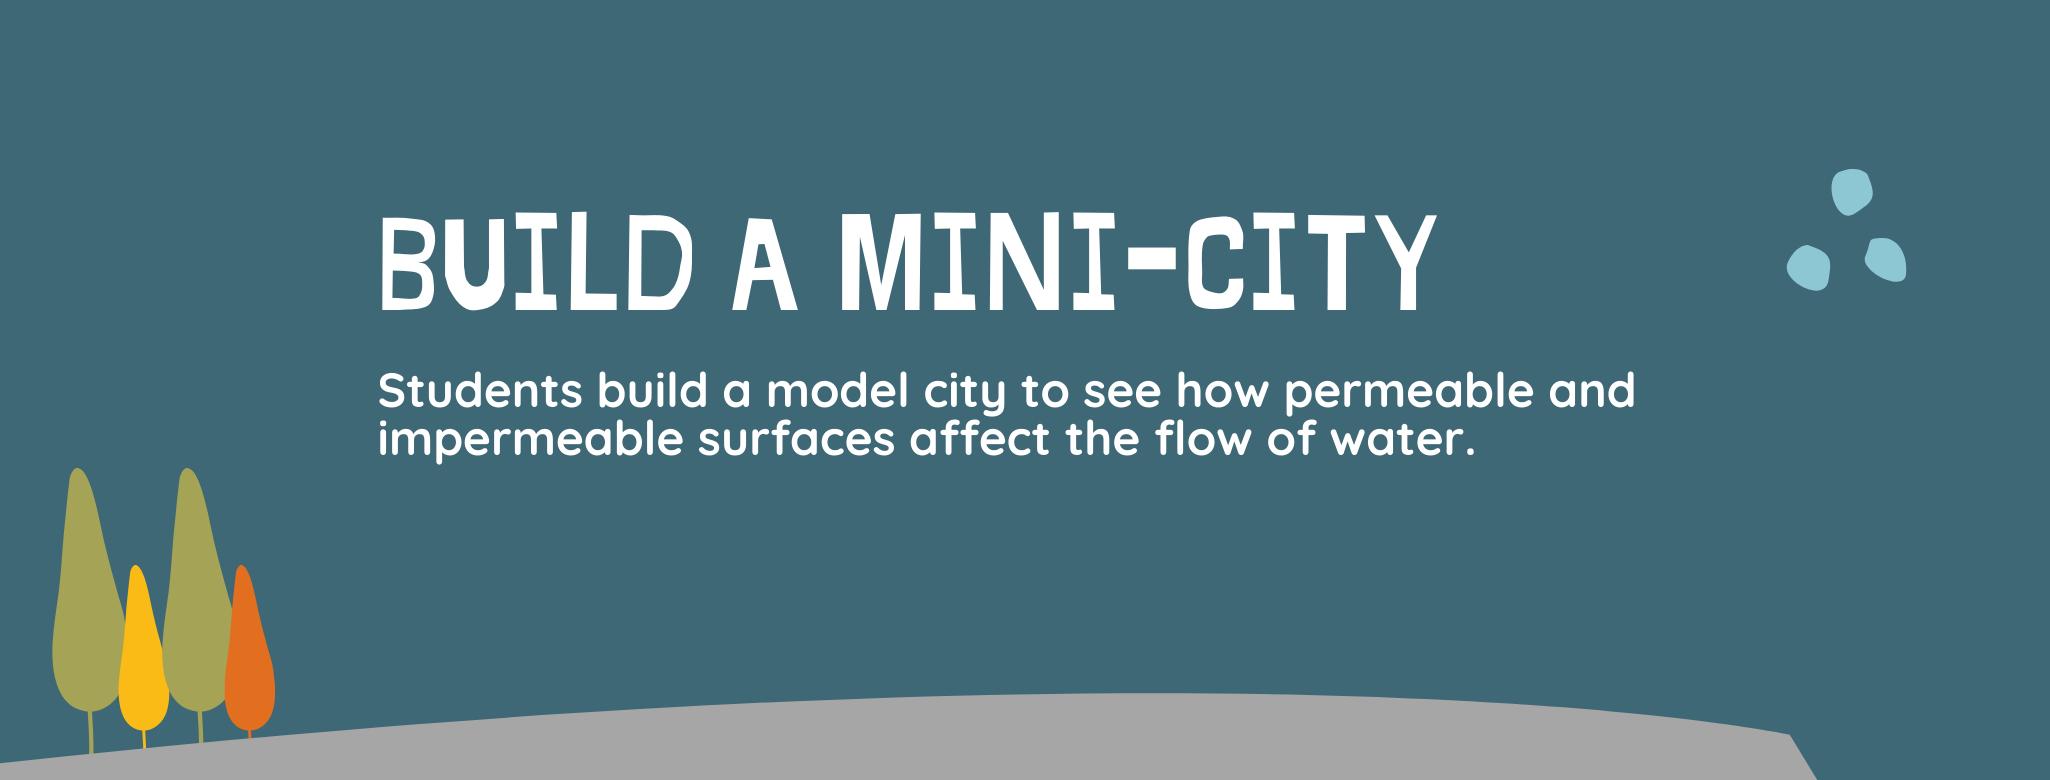 Build a Mini-City